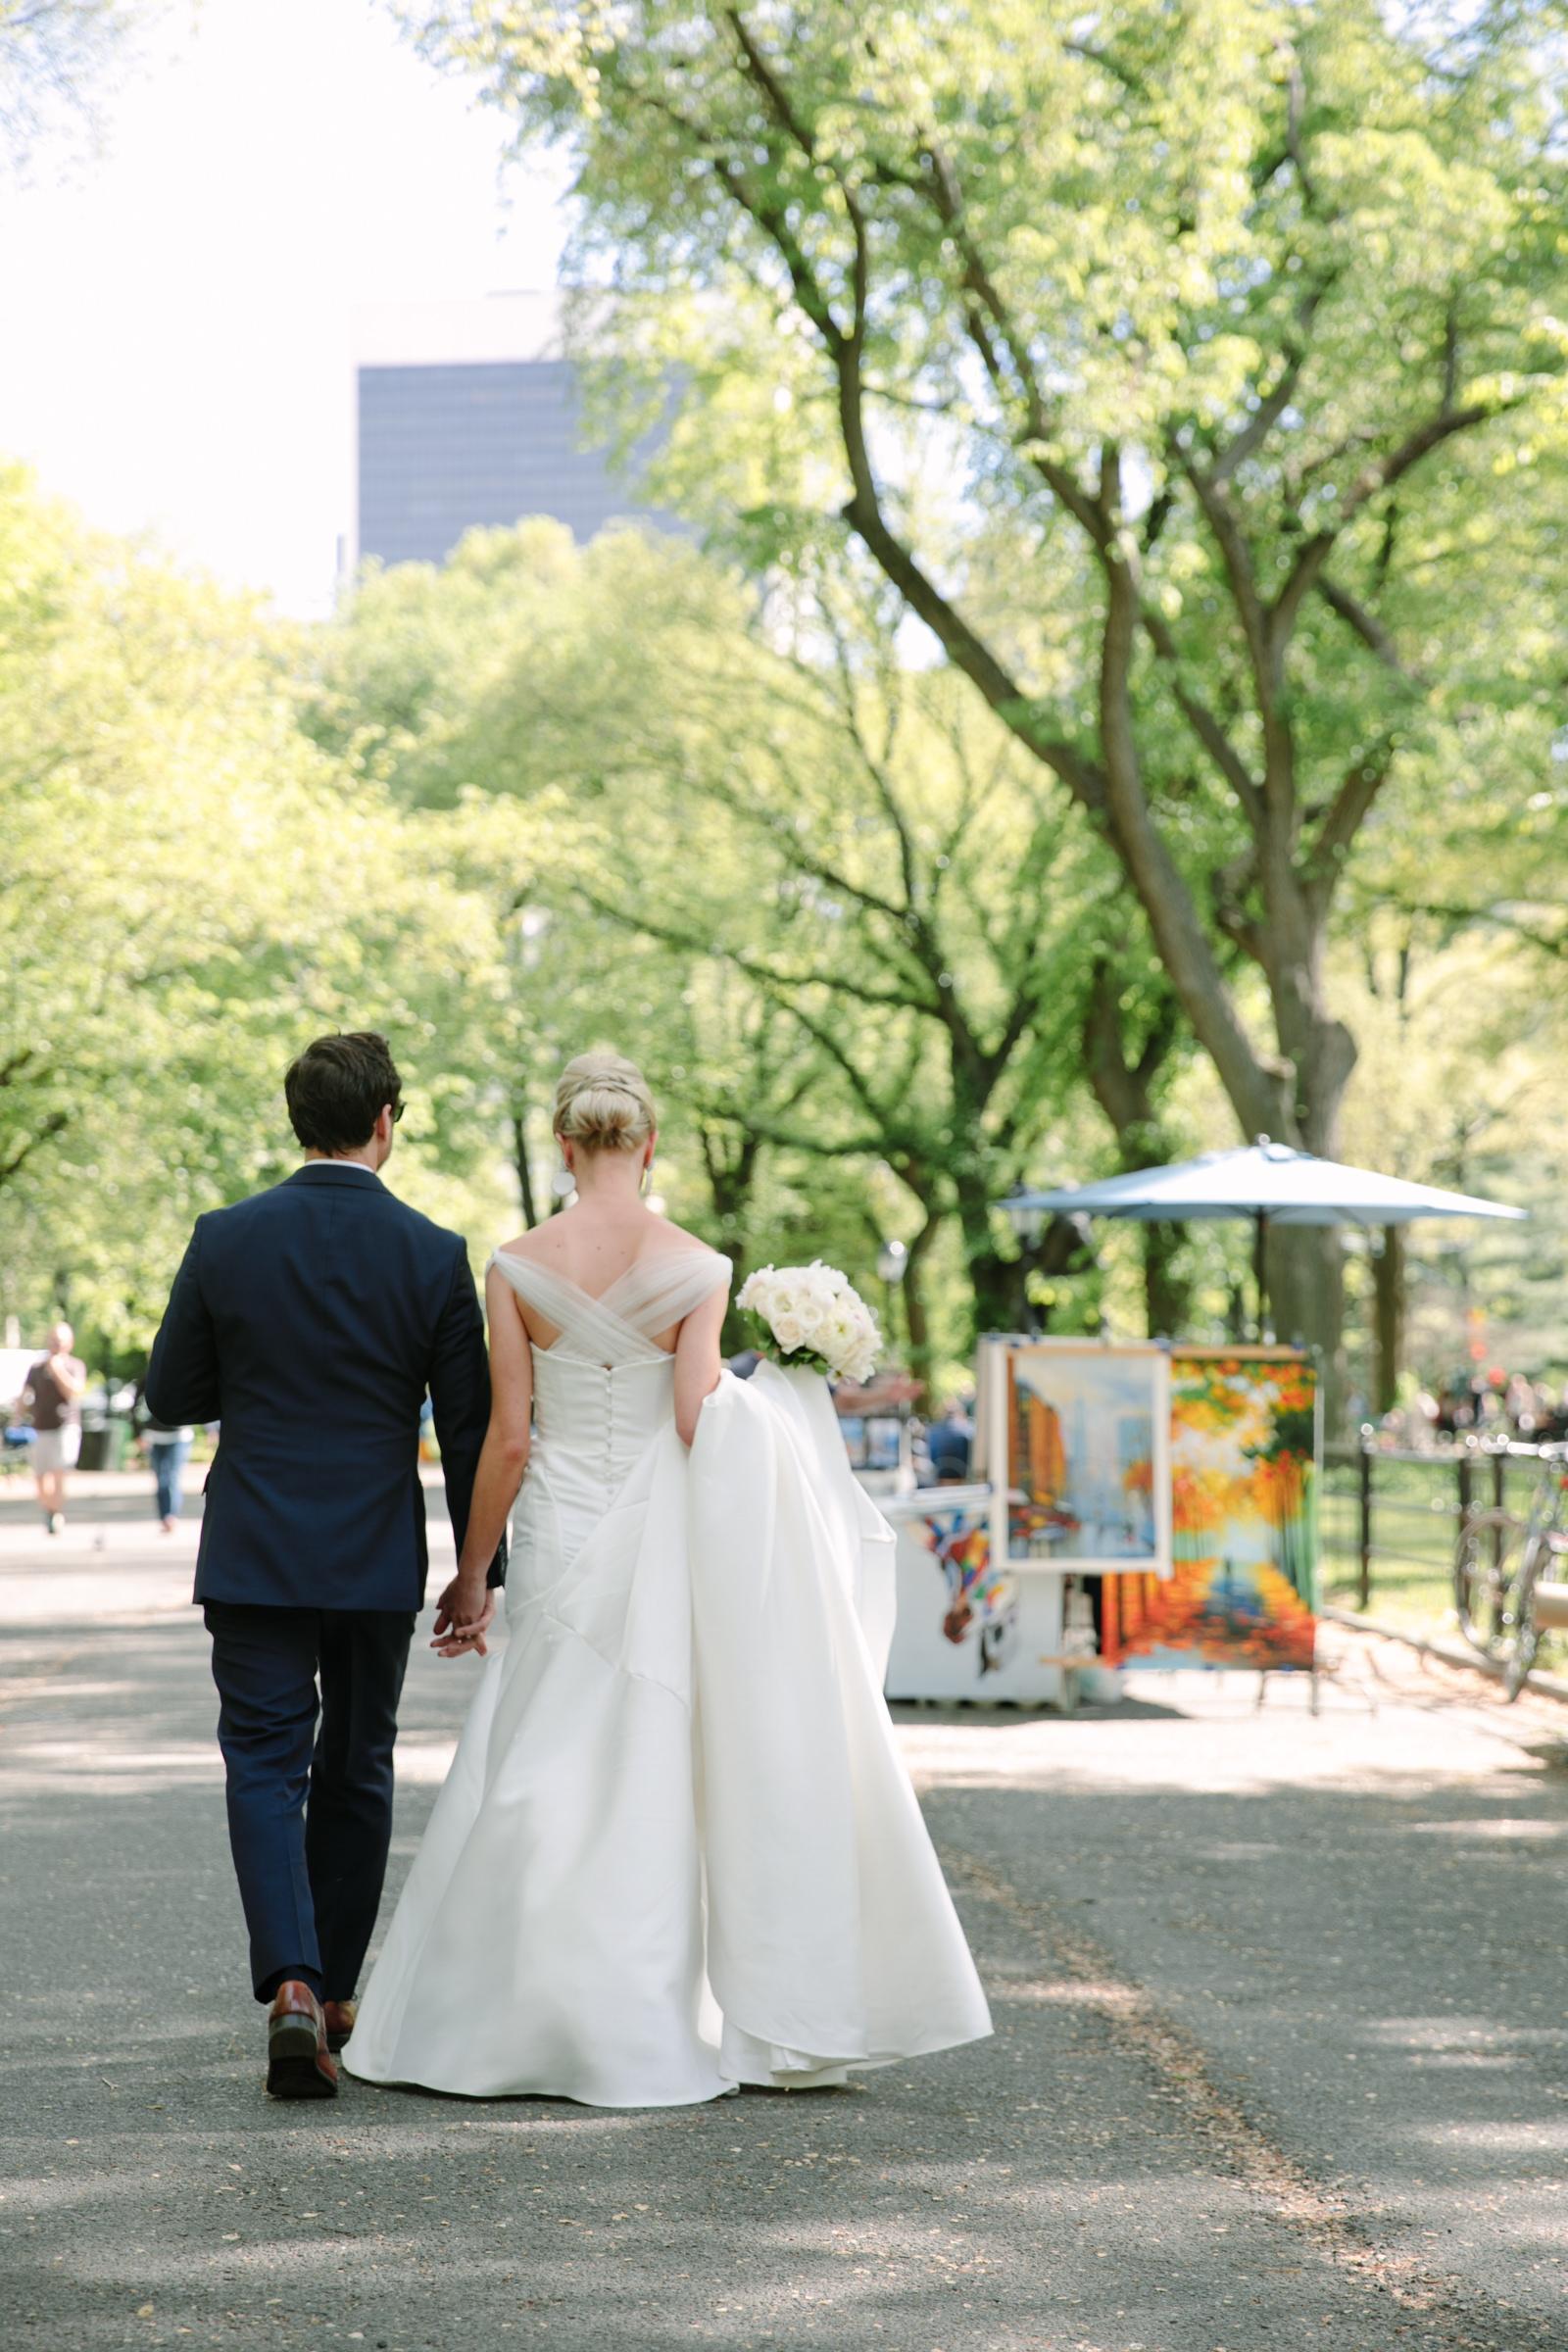 Intimate-NYC_wedding_ by Tanya Isaeva-121.jpg